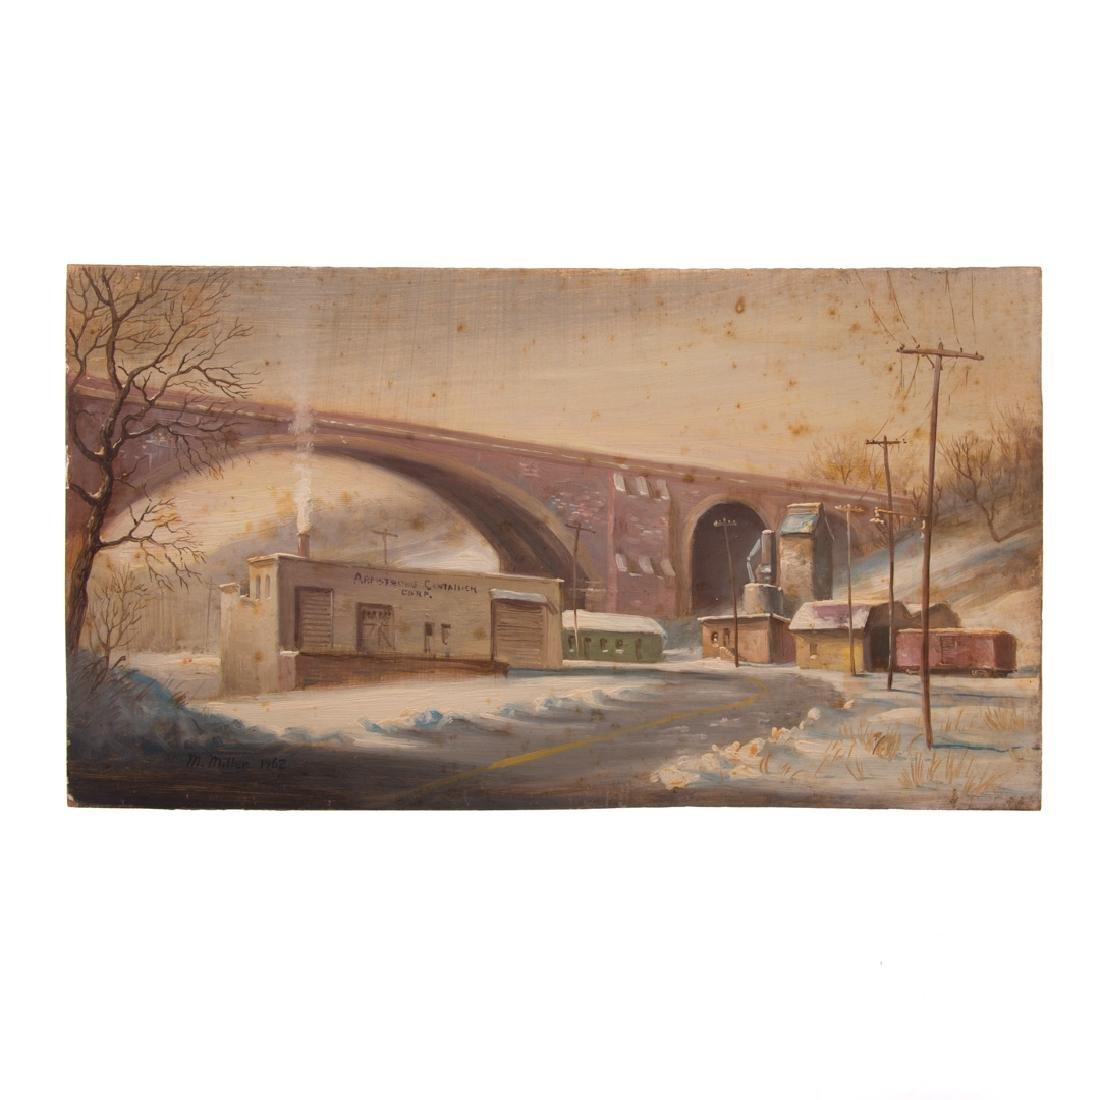 Melvin Miller. Bridge by Railroad, oil on masonite